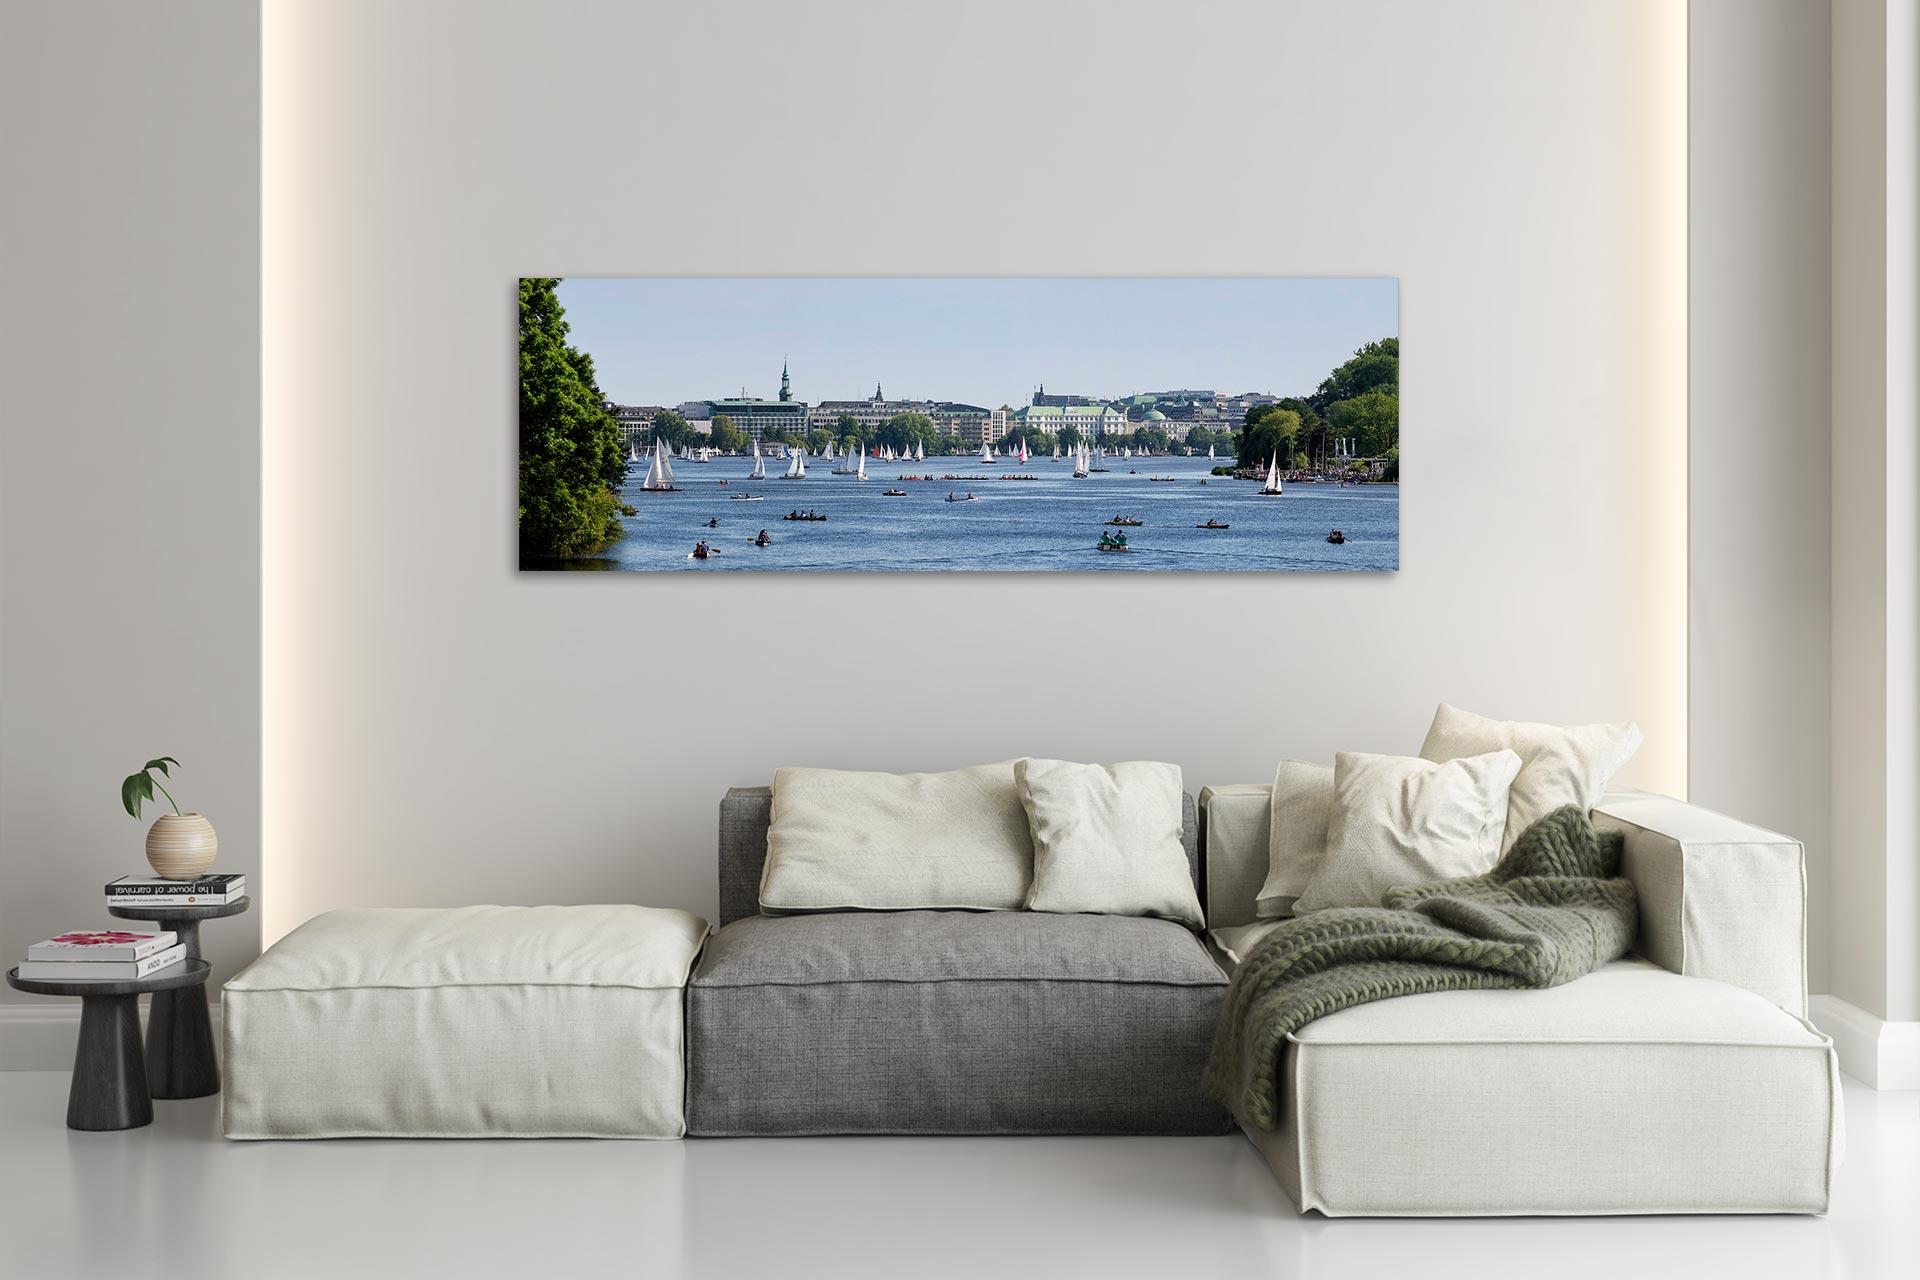 PSW027-panorama-alster-segeln-leinwand-acrylglas-aludibond-wohnzimmer